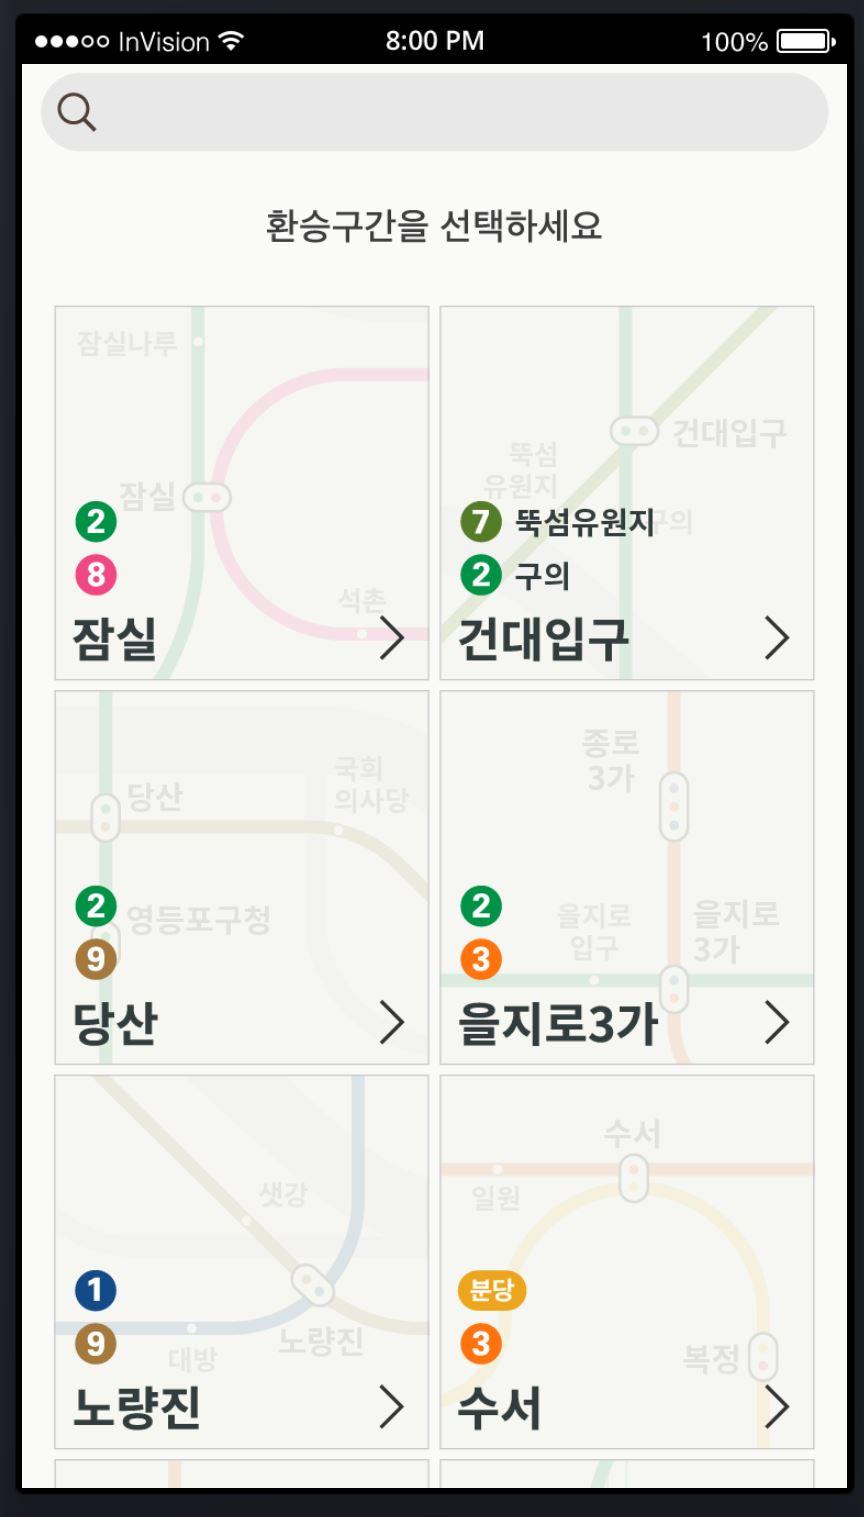 muui homepage-subway-noon design capture 1.JPG